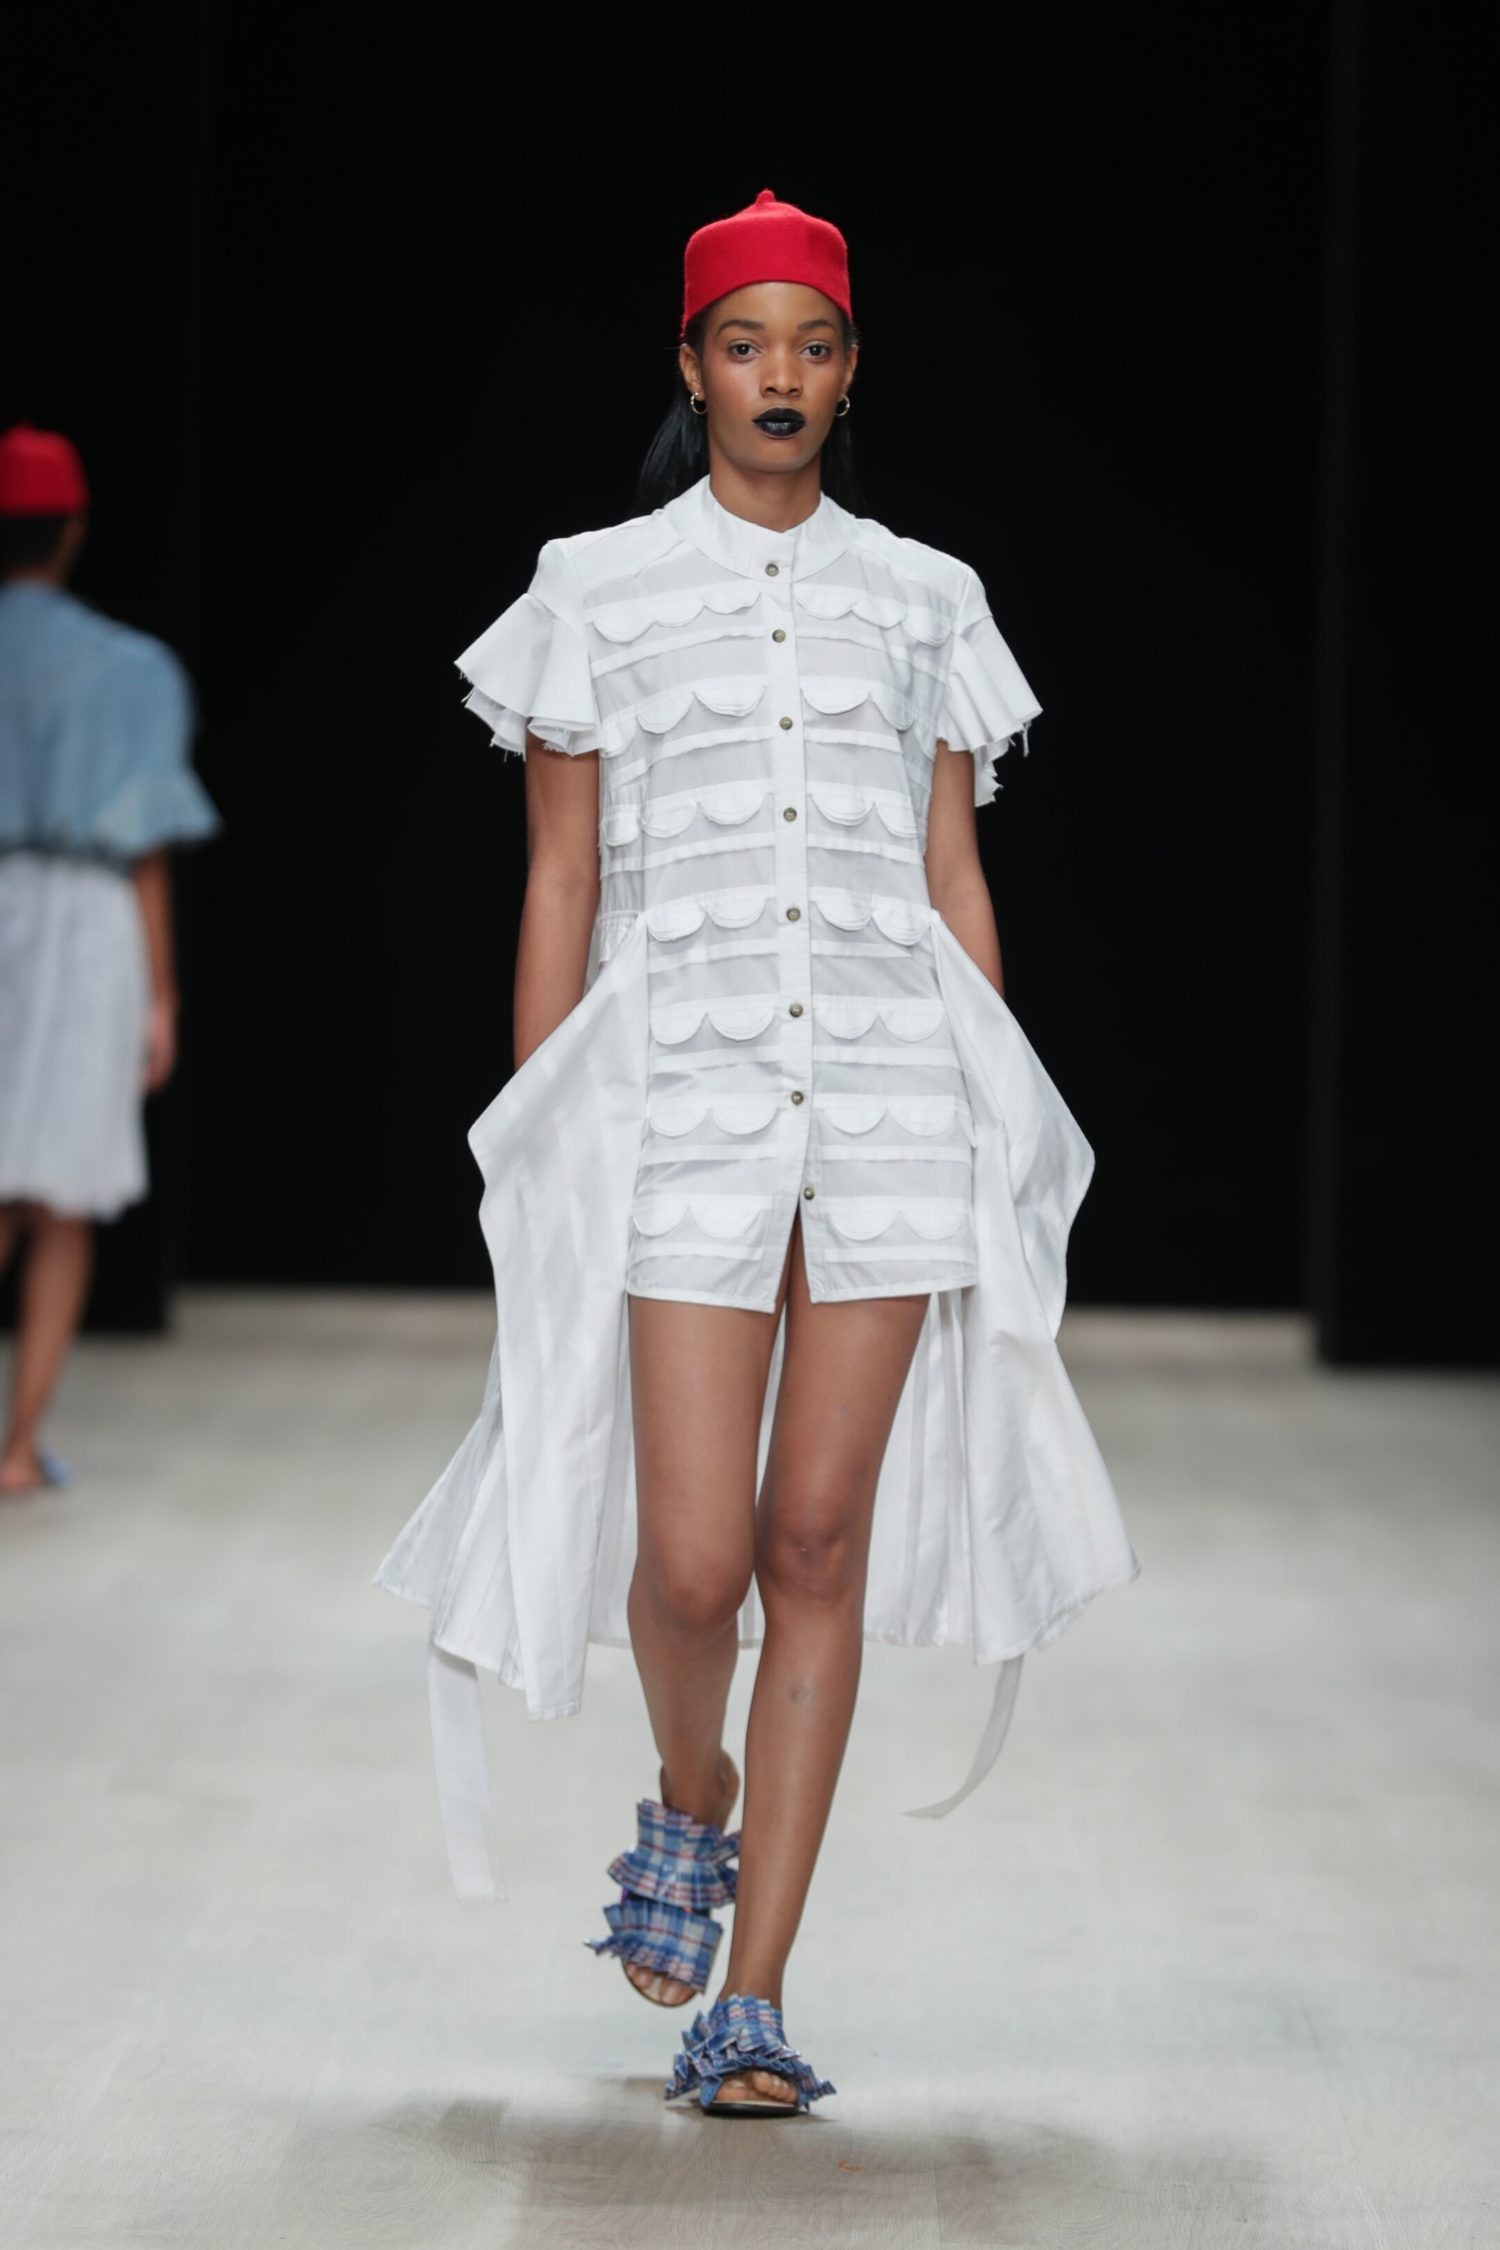 ARISE Fashion Week 2019 | NKWO